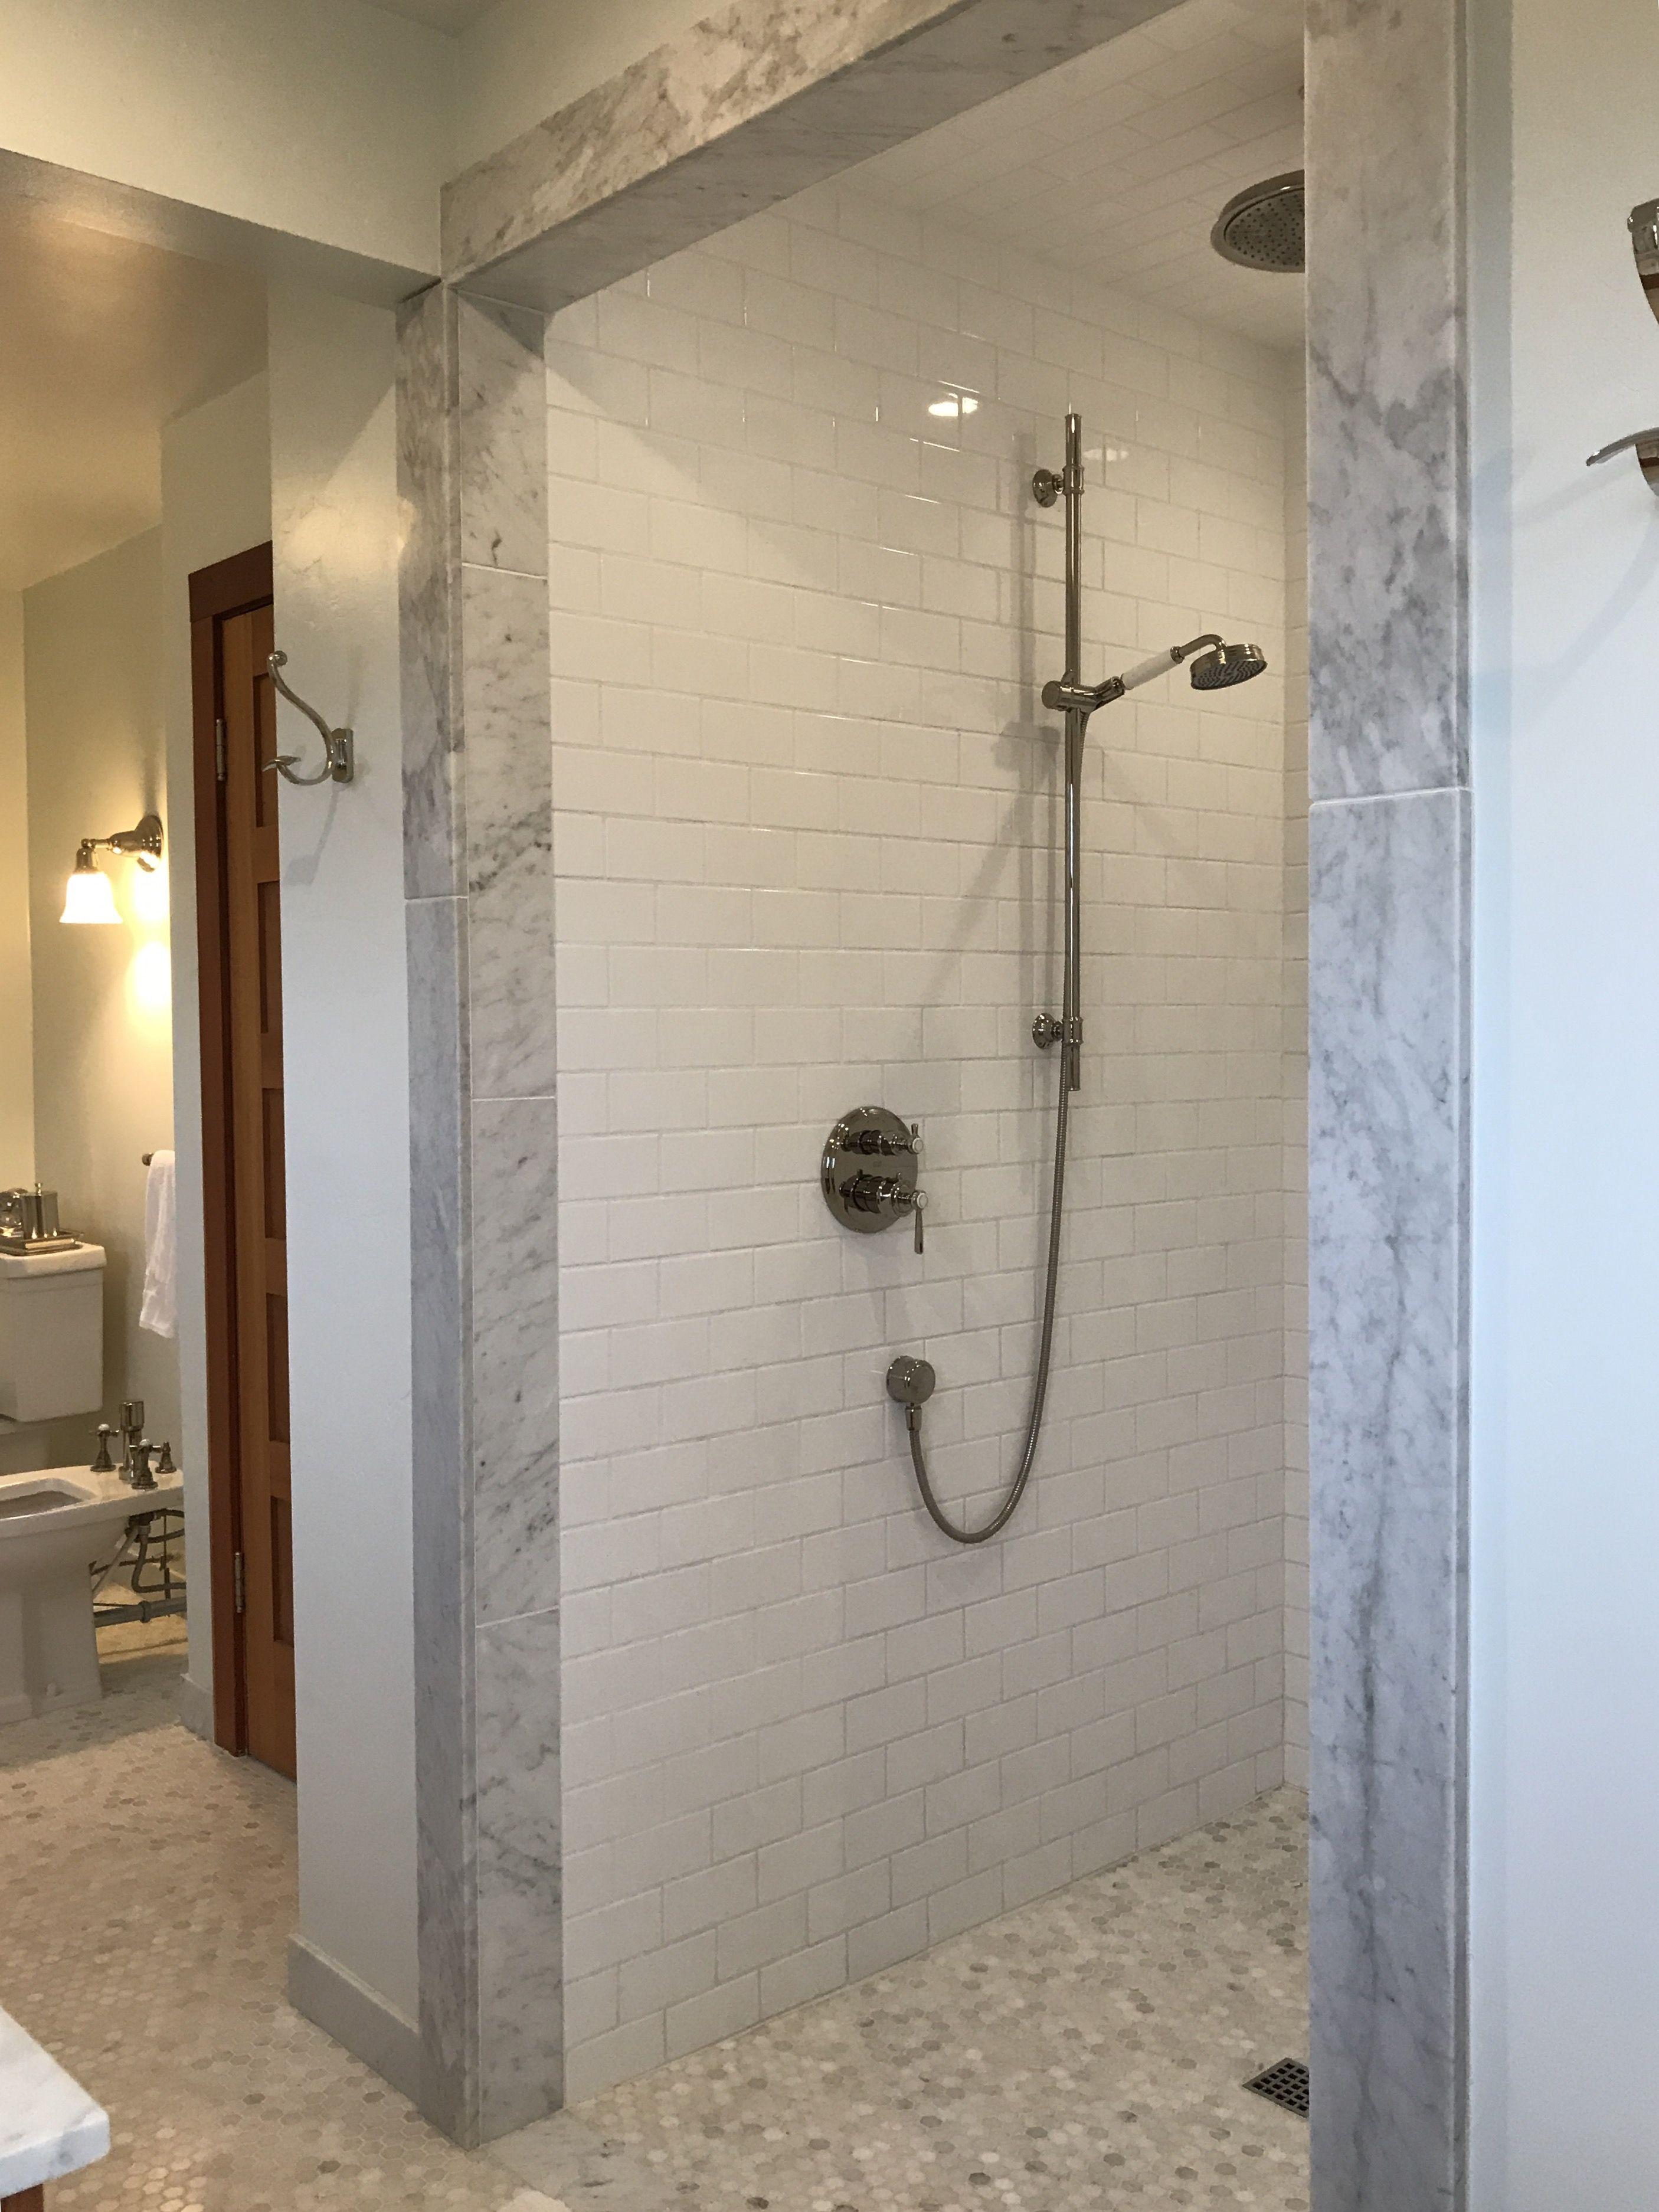 Marble Master Bathroom Walk In Shower No Lip No Curtain No Door Love It Shower Tub Walk In Shower Master